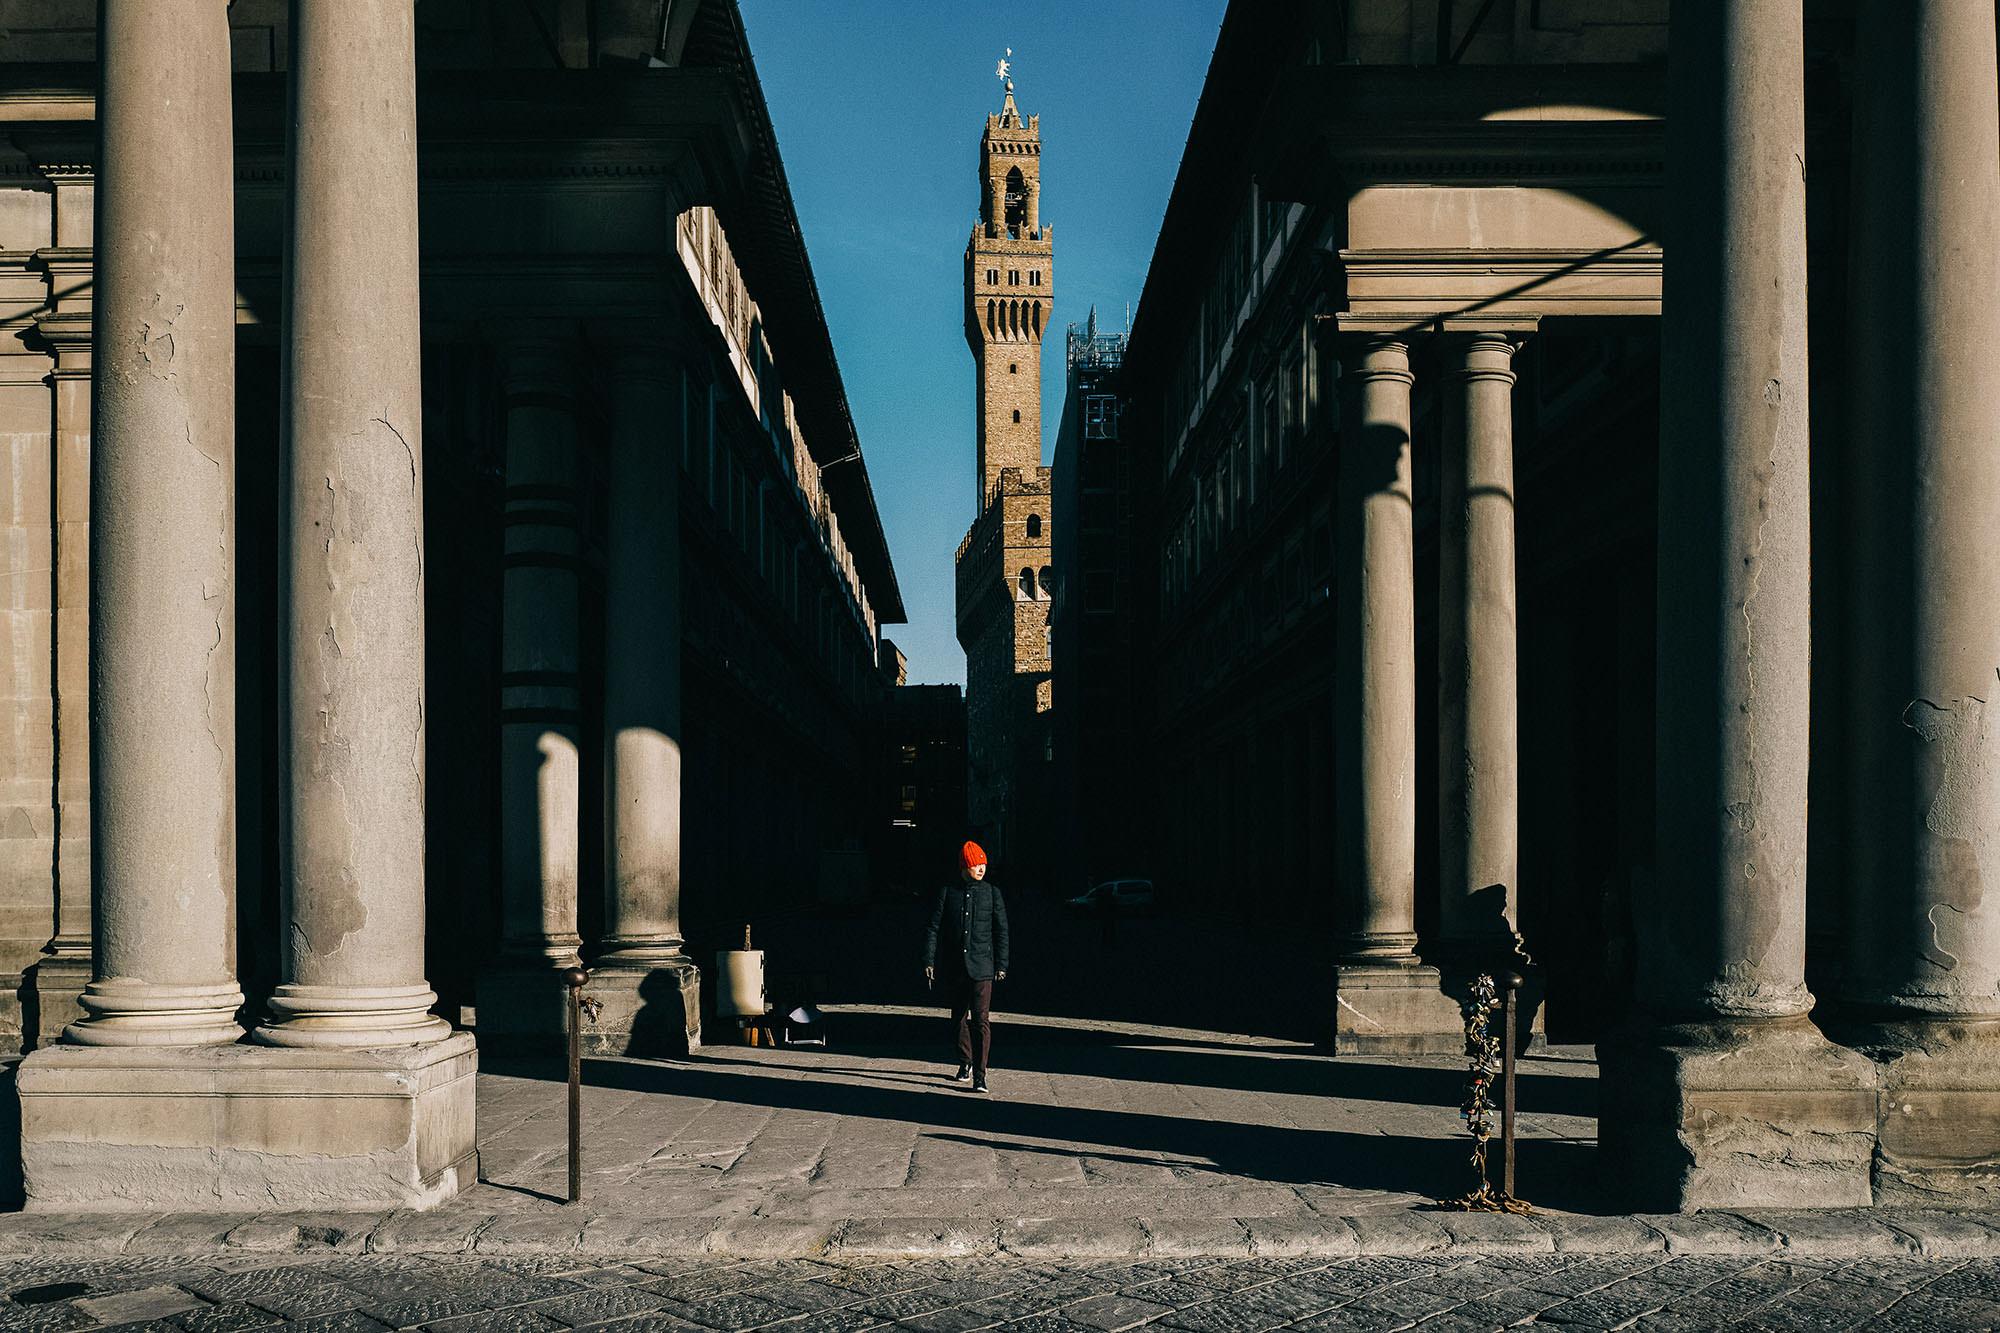 stefano santucci street photographer